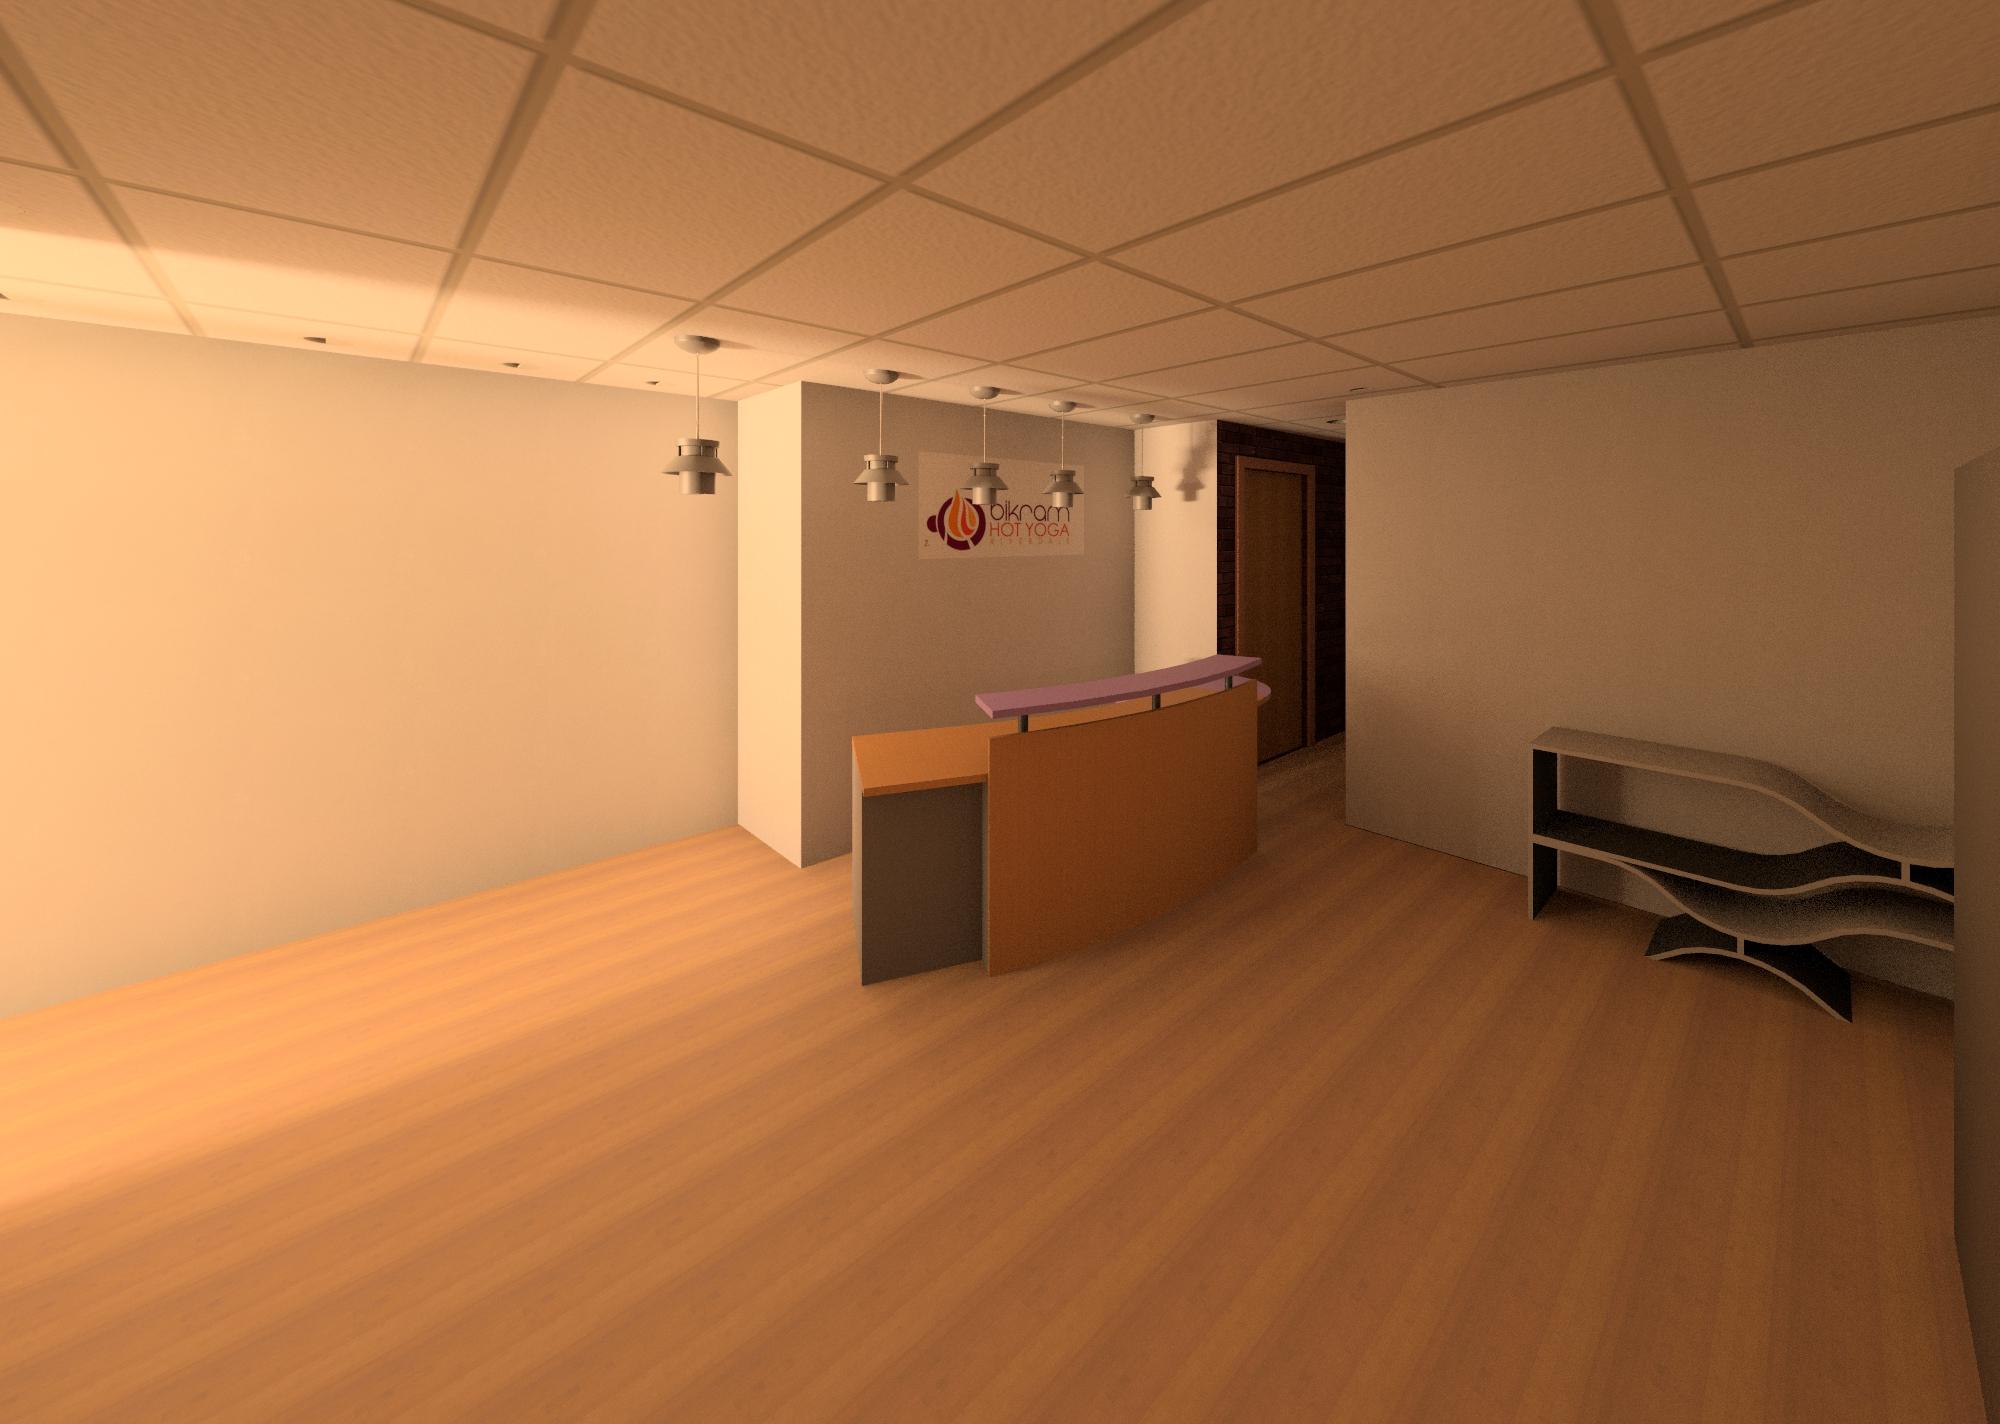 Project1_Birkum_Hot_Yoga_Hyattsville.rvt_2013-Mar-29_02-06-44PM-000_3D_View_1__Yoga_Studio_Second_Floor_Reception_View_1.jpg